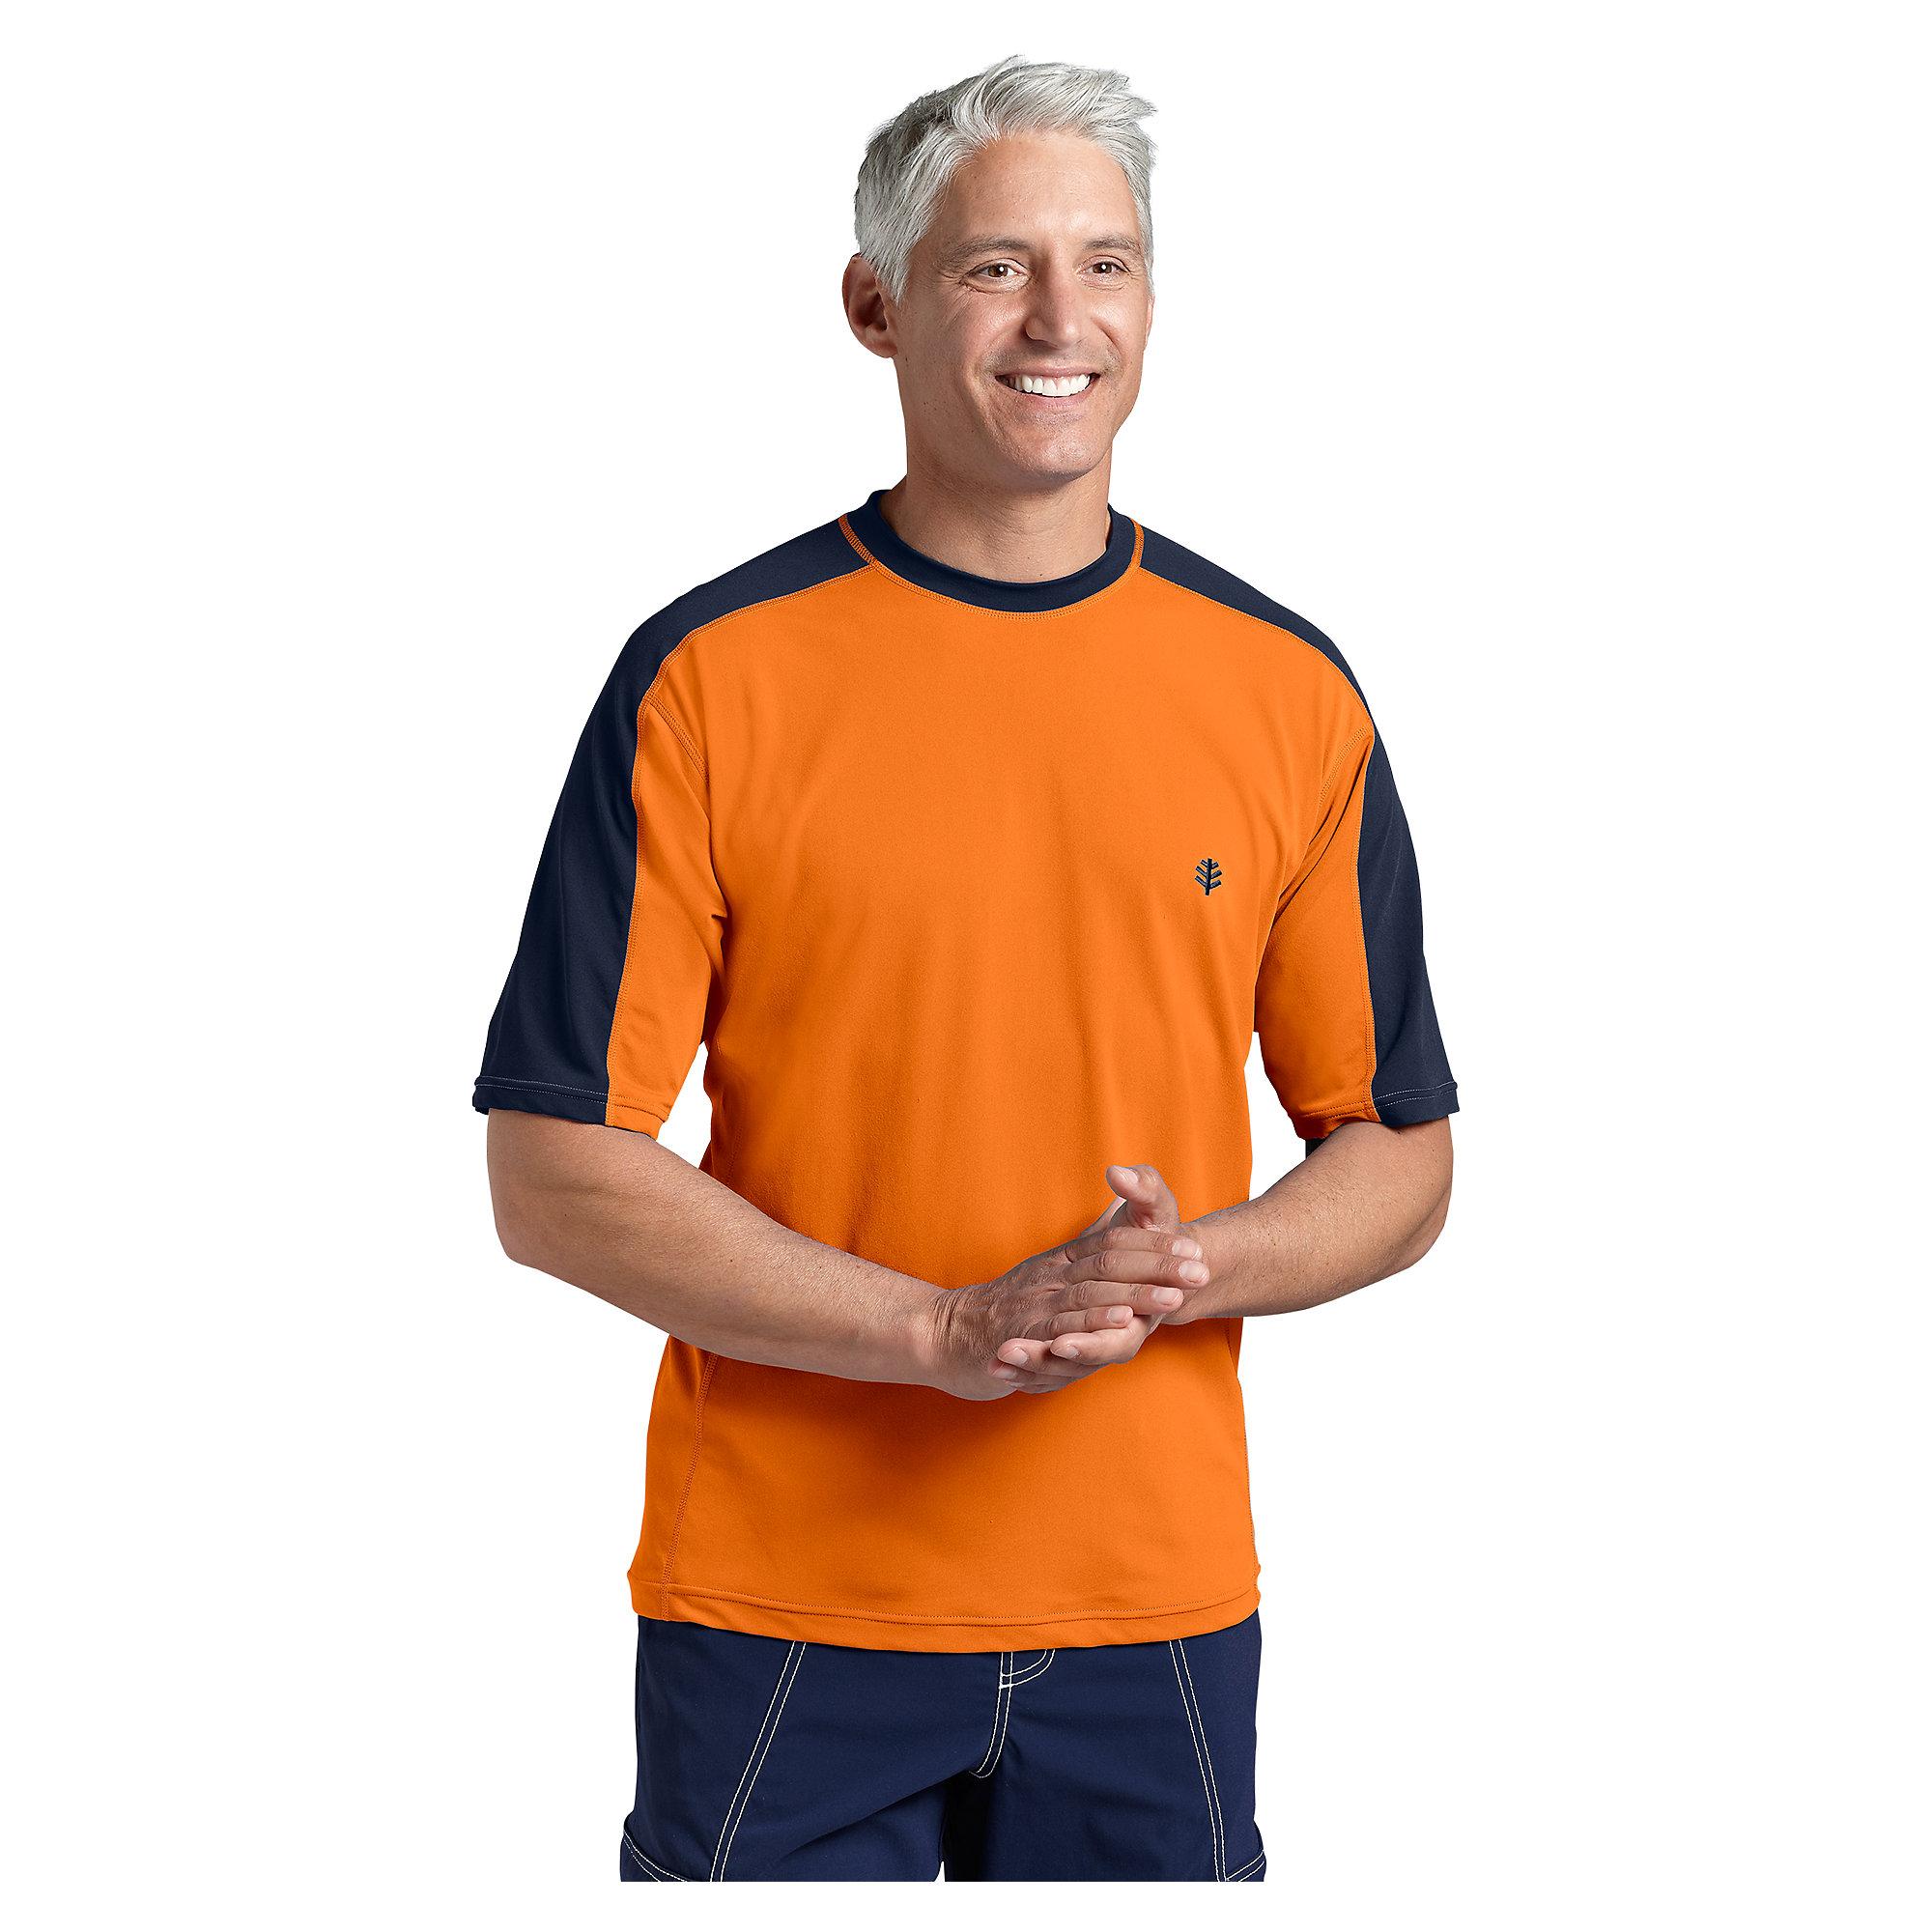 Coolibar upf 50 men 39 s short sleeve crewneck swim shirt ebay for Men s uv swim shirt short sleeve